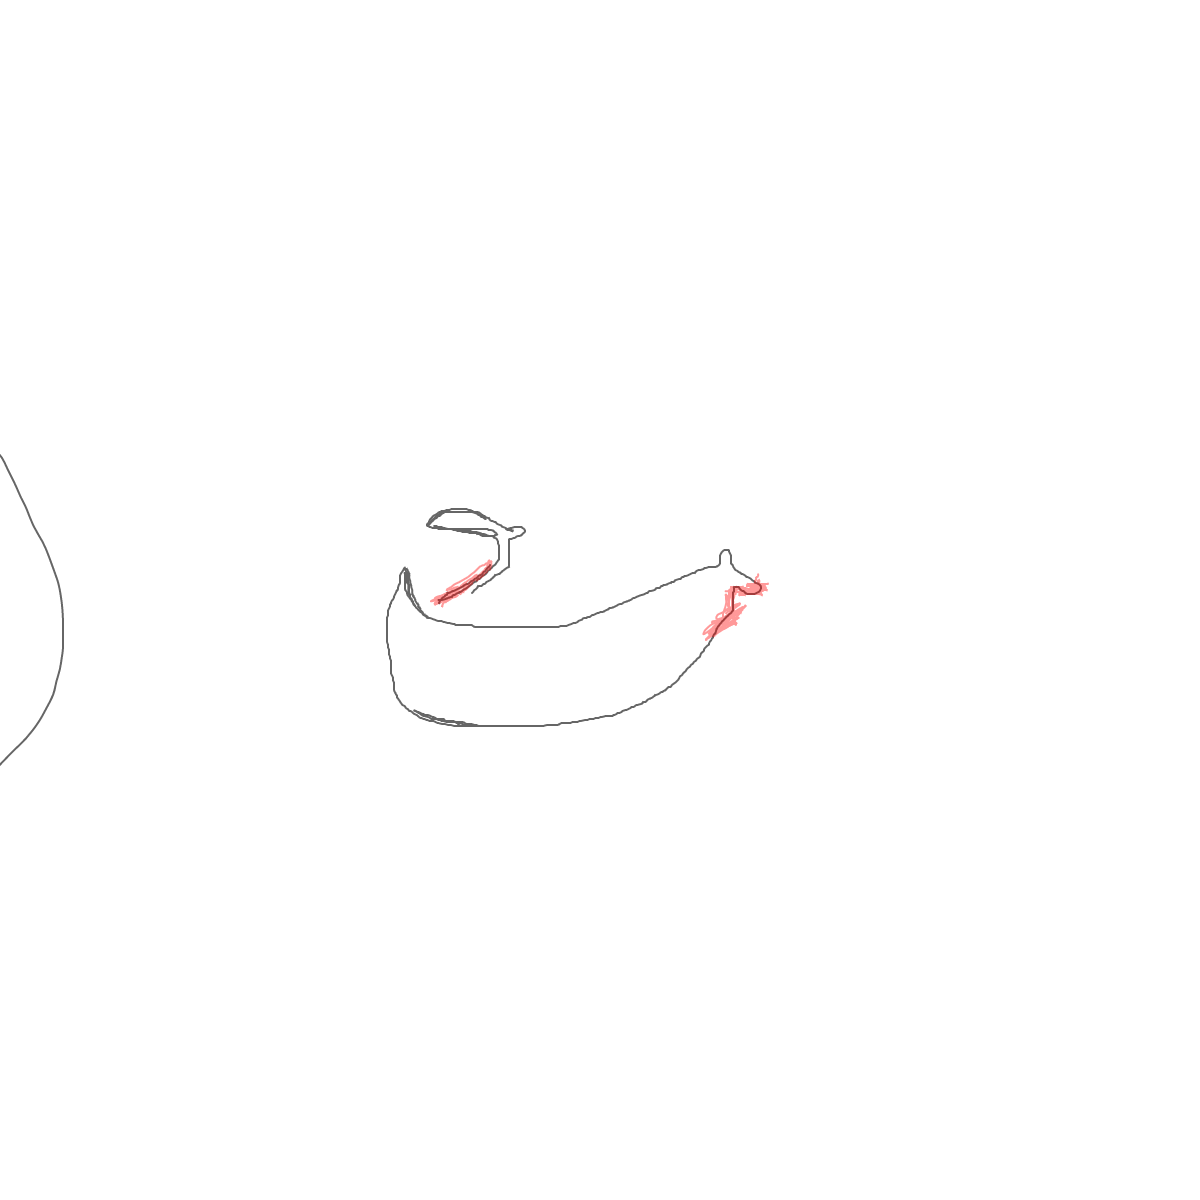 BAAAM drawing#23674 lat:48.8126754760742200lng: 2.3849227428436280